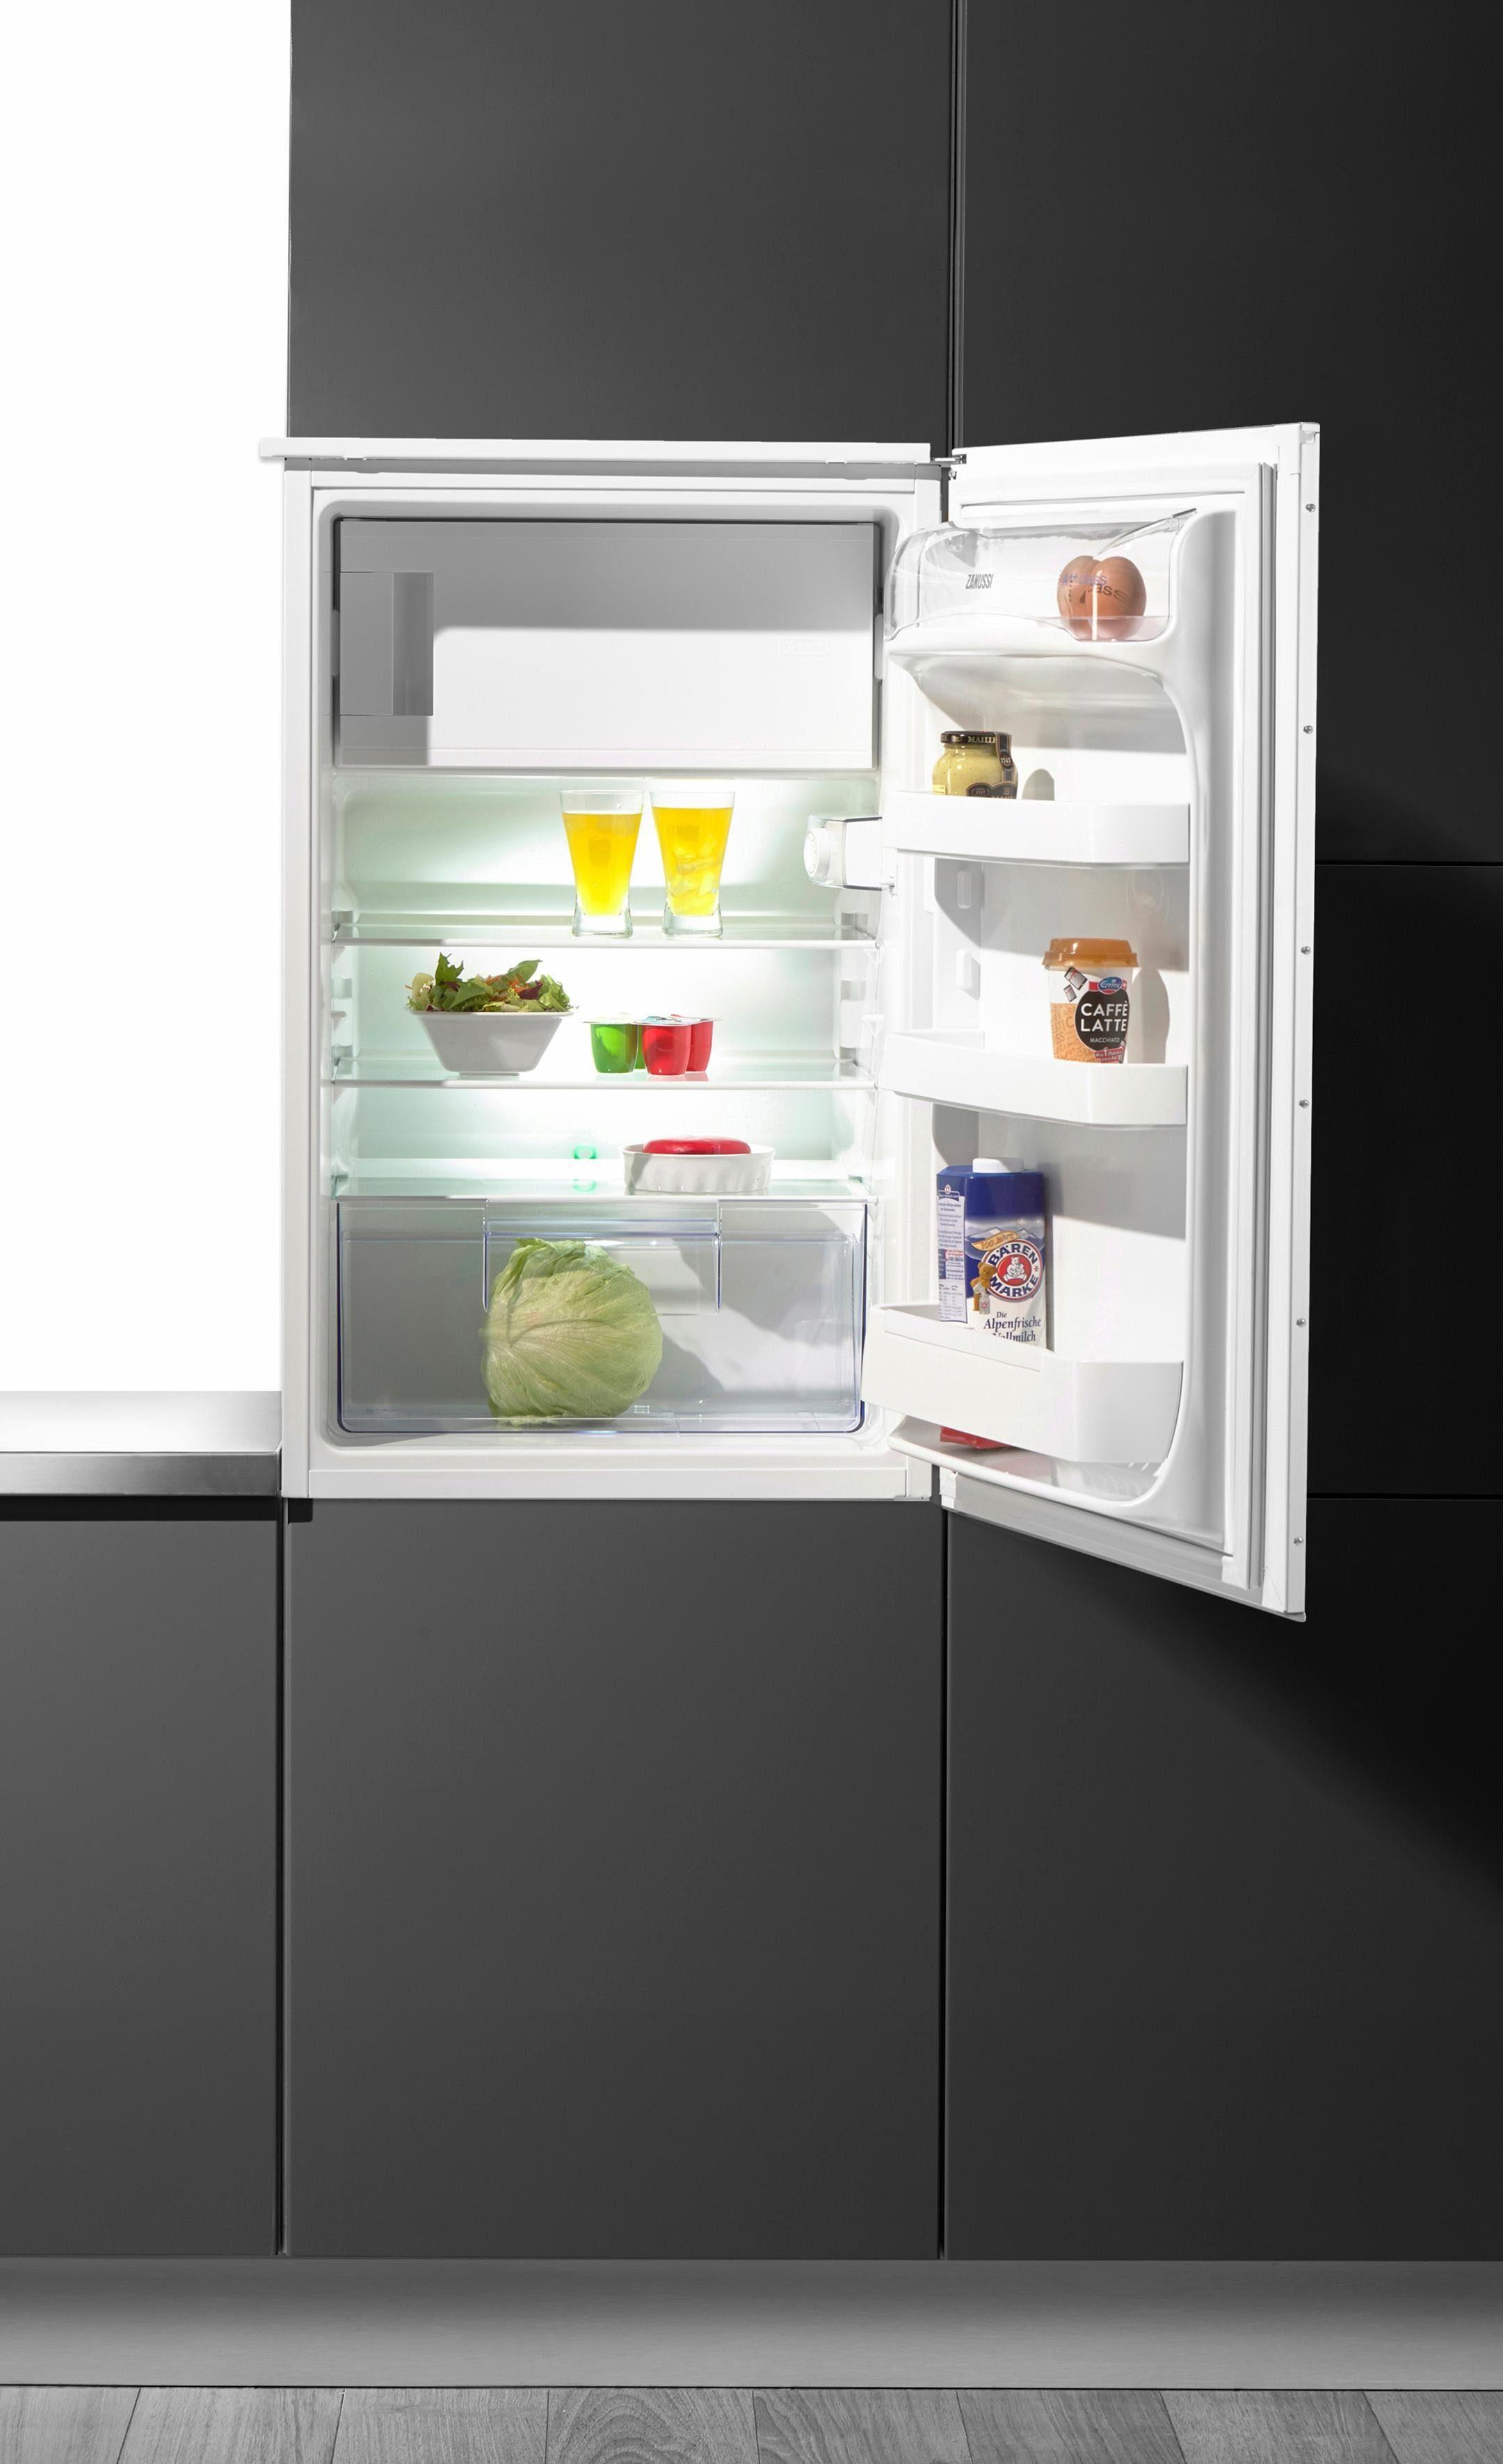 Zanussi dekorfähiger Einbaukühlschrank ZBA14440WA, A++, 87,3 cm hoch